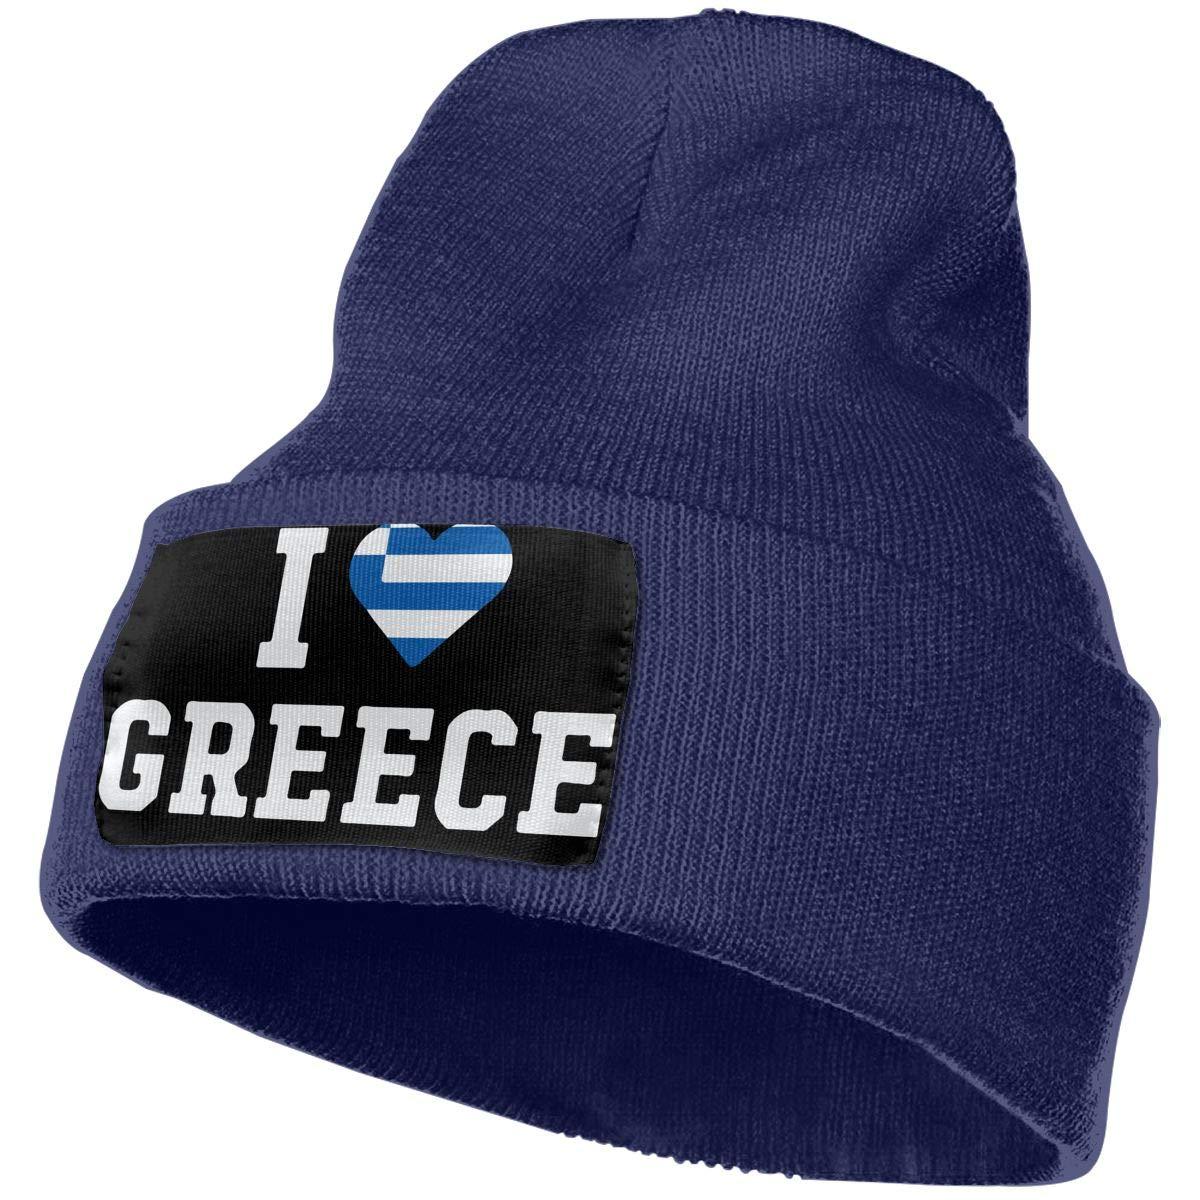 I Love Greece Flag Heart Men Women Knit Hats Stretchy /& Soft Beanie Cap Hat Beanie